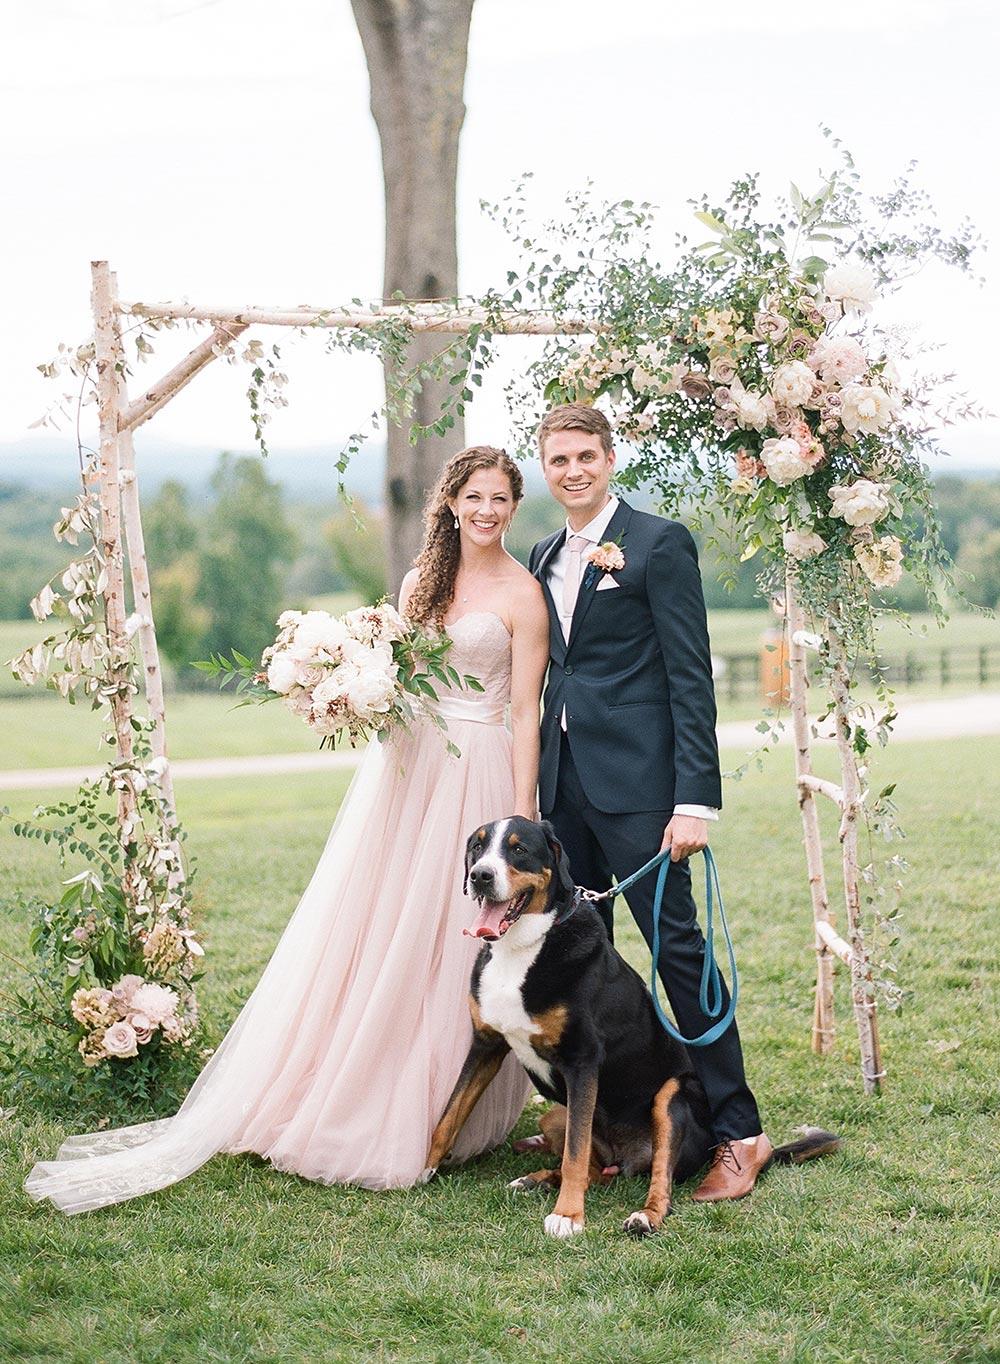 blush wedding dress and navy groom suit with birch wedding ceremony arbor